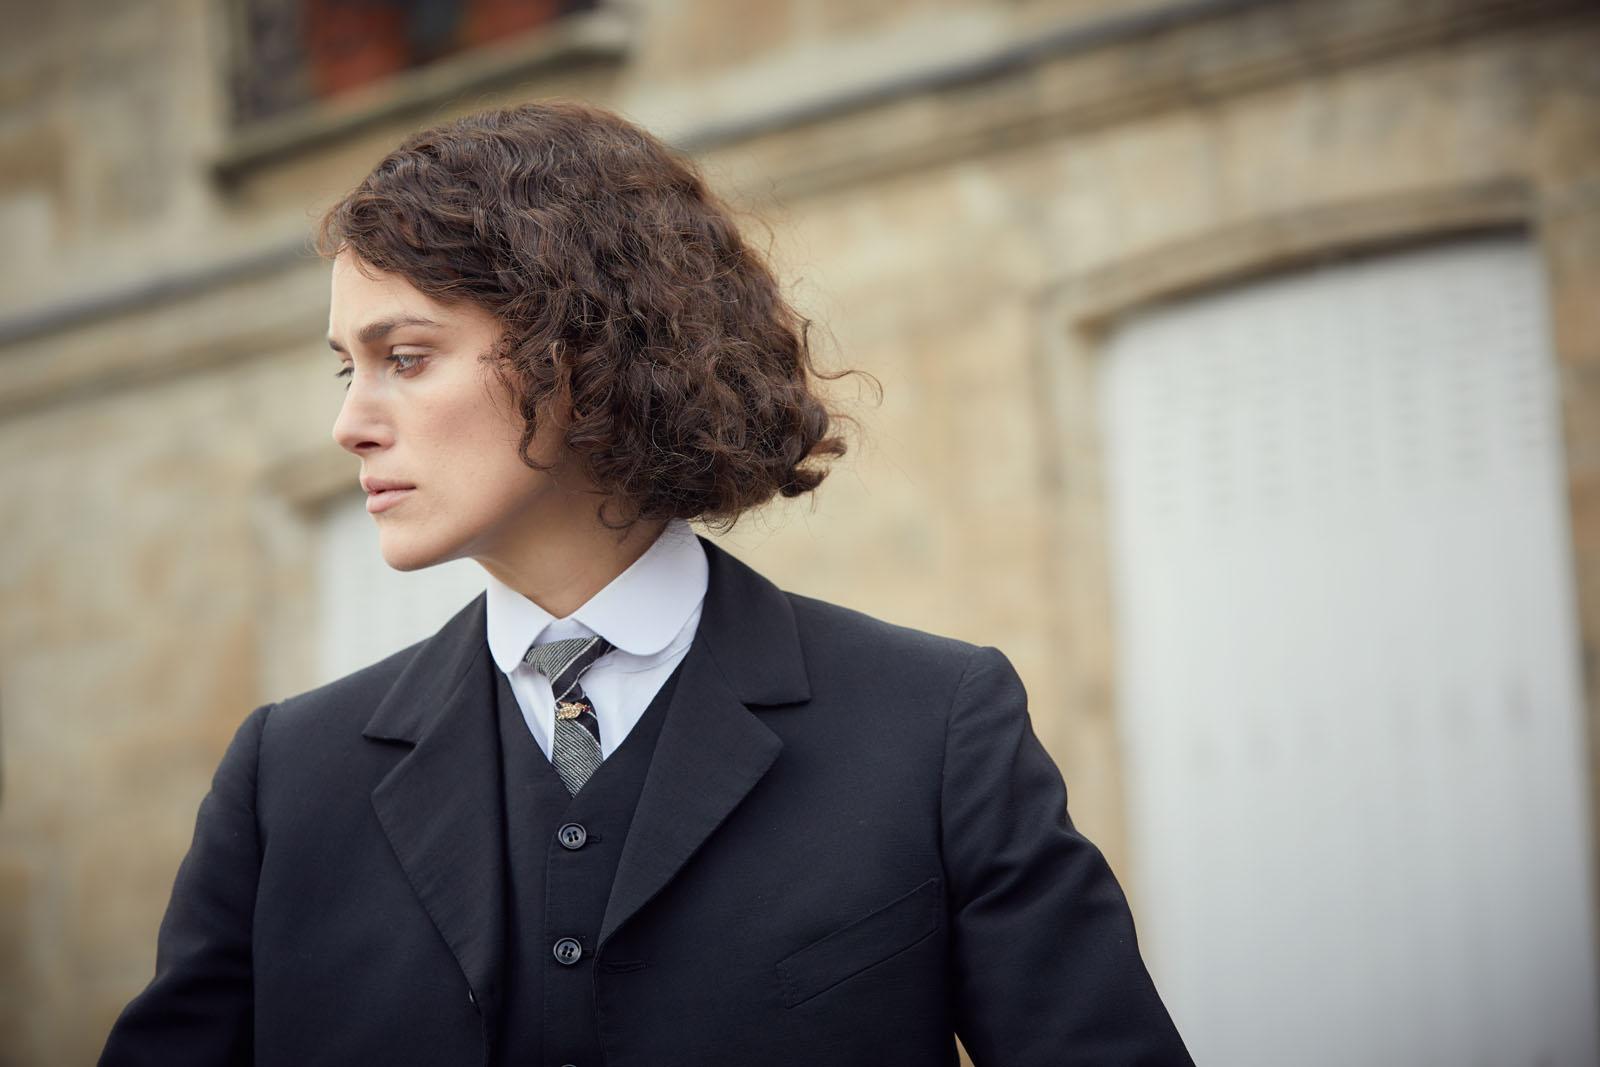 Colette critique photo avis cinema film Keira Knightley